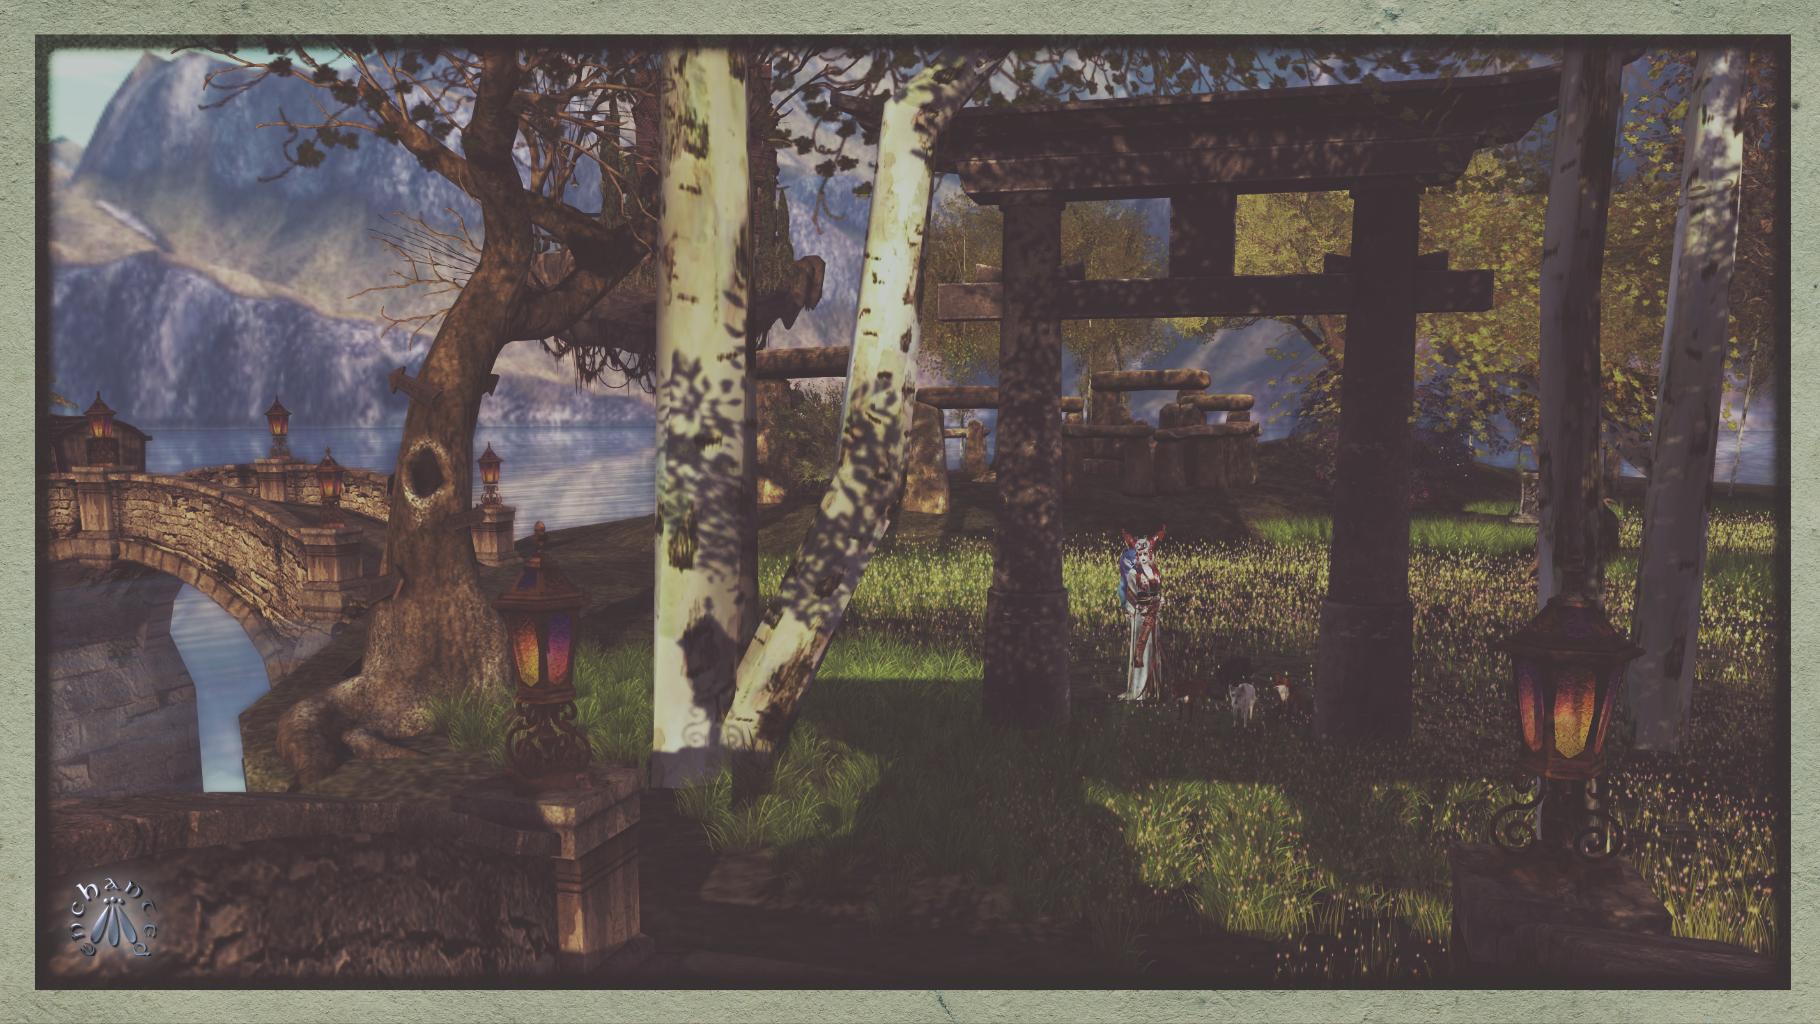 enchantment kitsune 3 edit - 1 BLOG